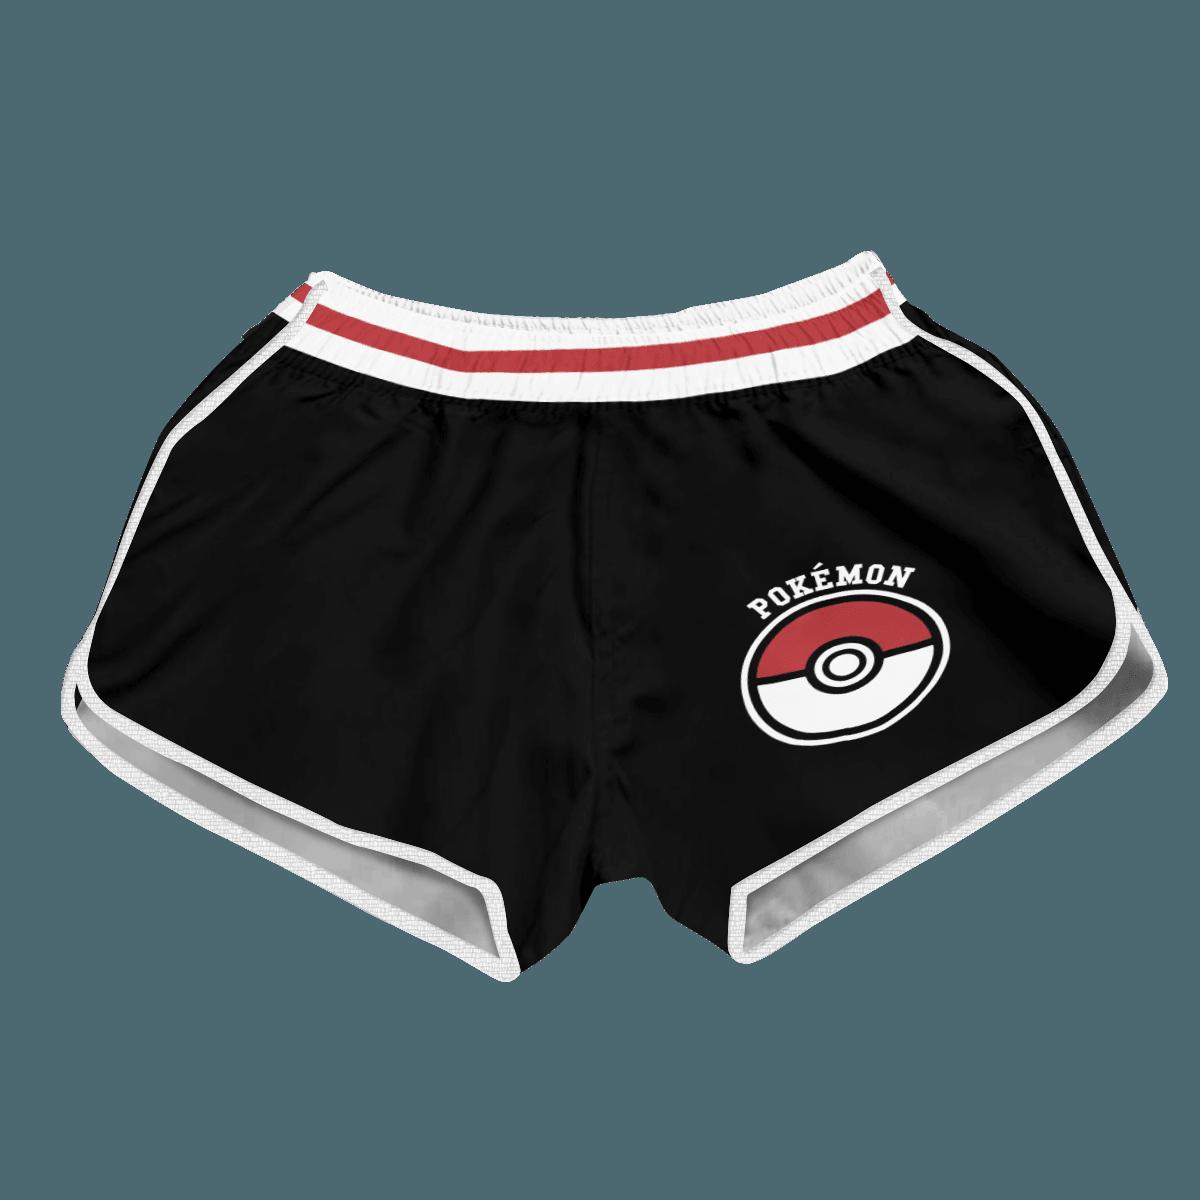 Pokemon Trainer Women Beach Shorts FDM3107 XS Official Anime Swimsuit Merch